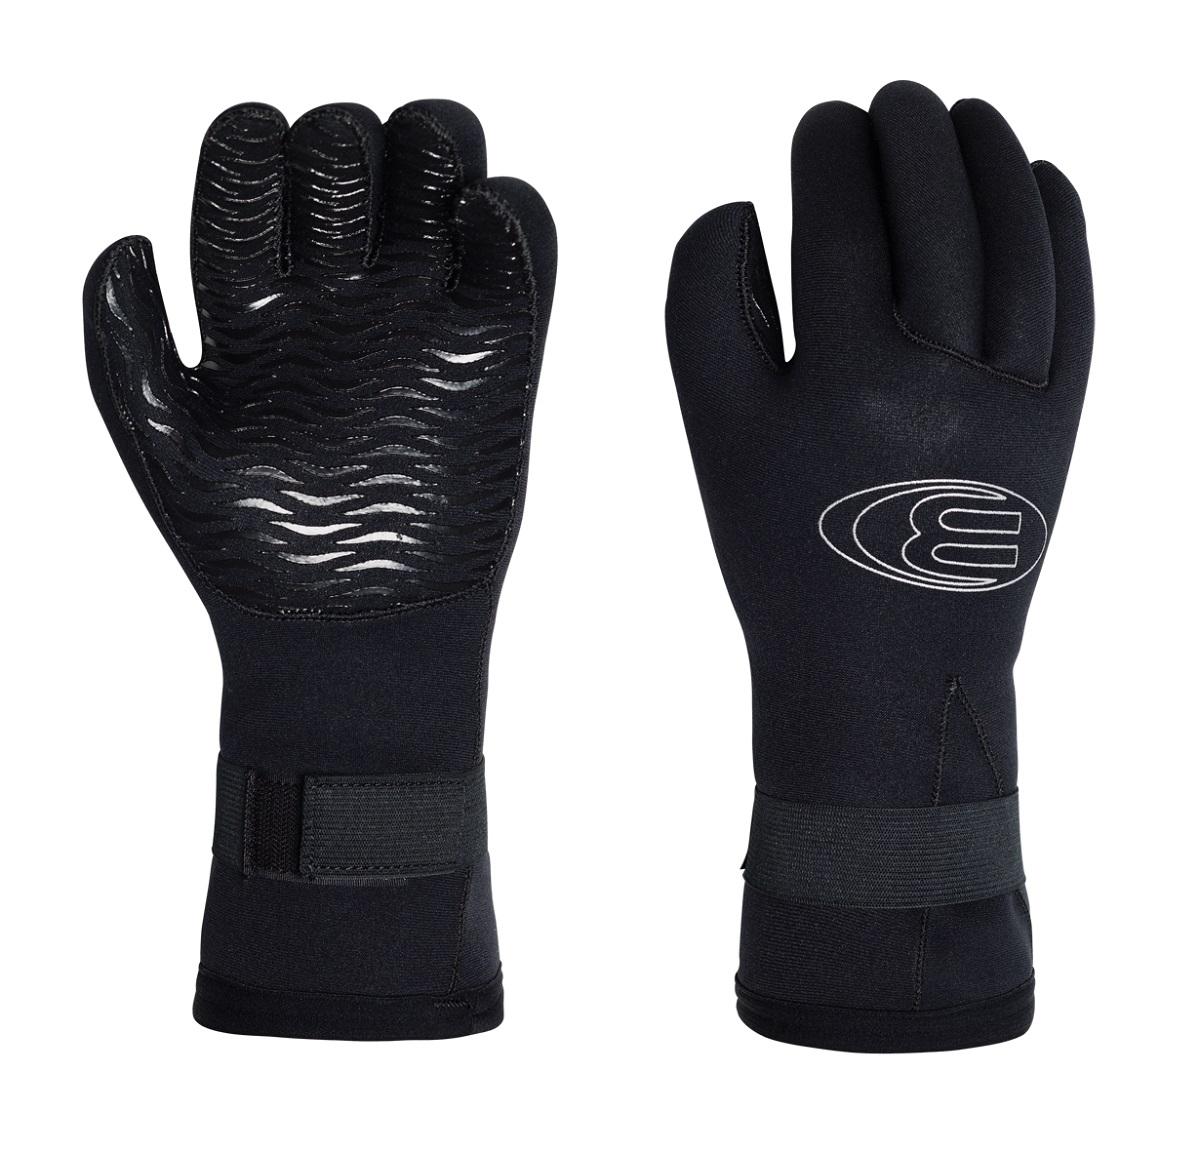 Bare 5mm Gaunlet Glove